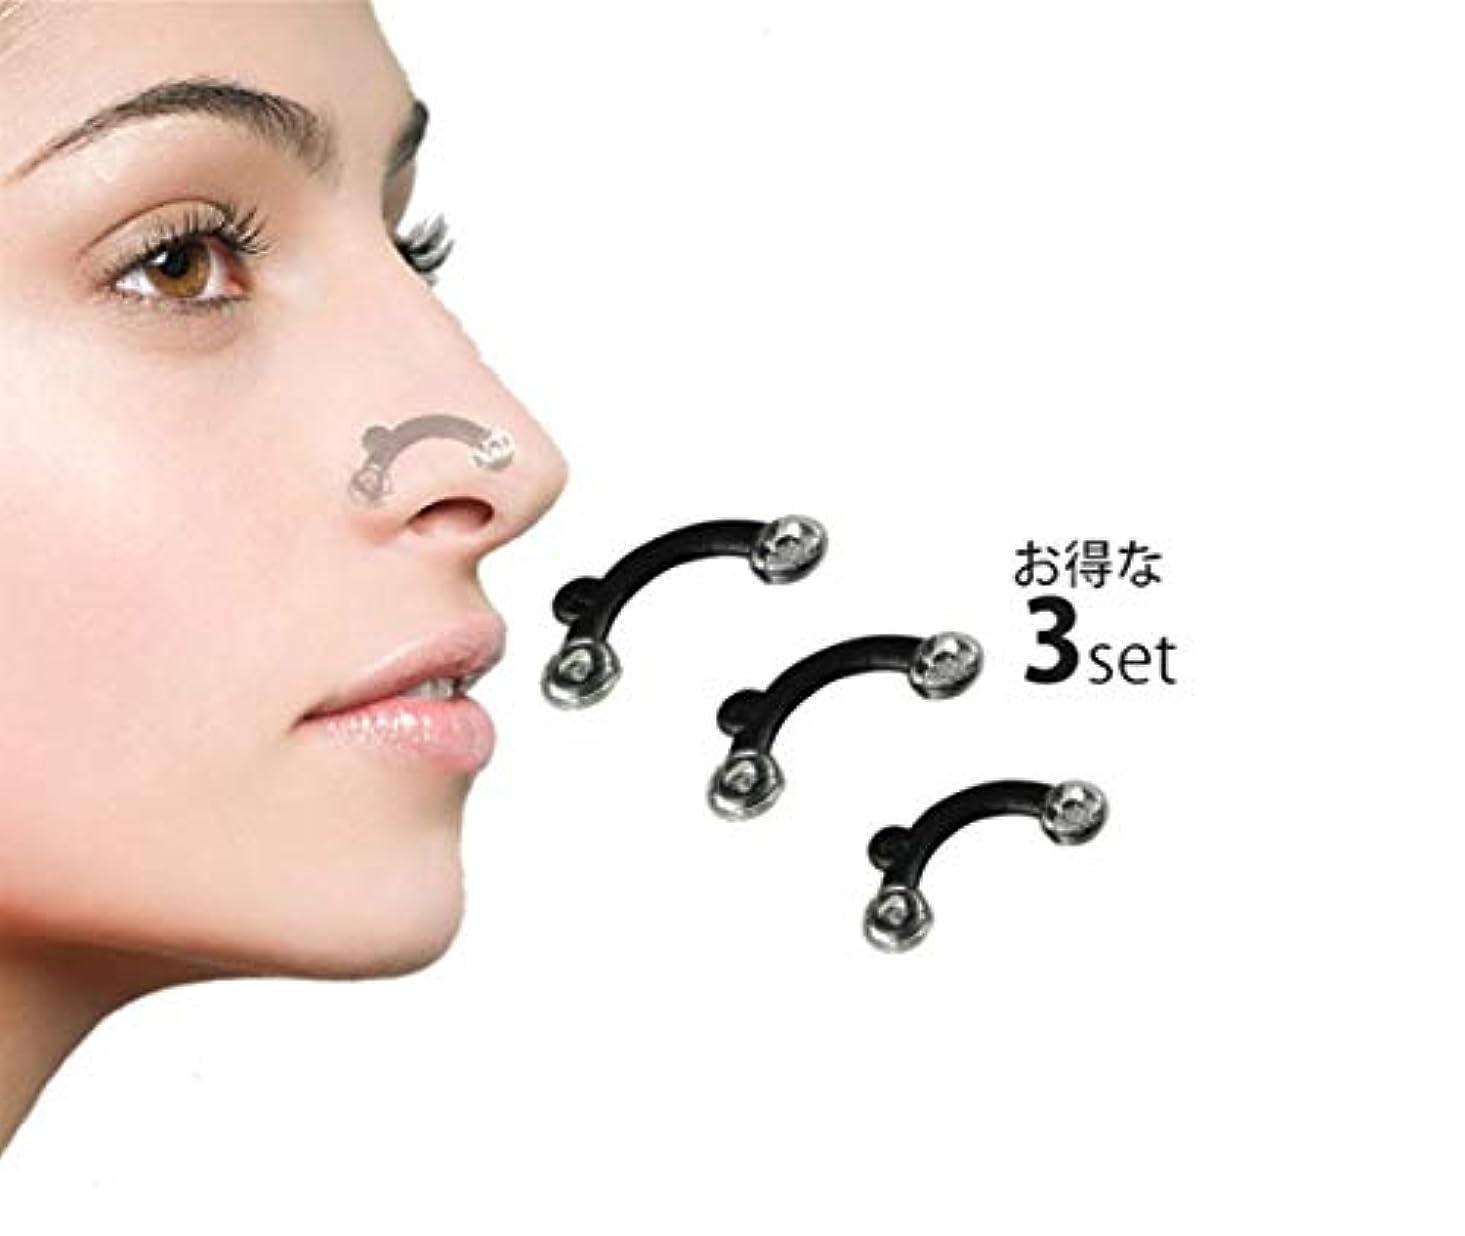 YONGOTEN 美鼻プチ 鼻のアイプチ 矯正プチ 柔軟性高い 整形せず 痛くない 医療用 美容用 シリコン